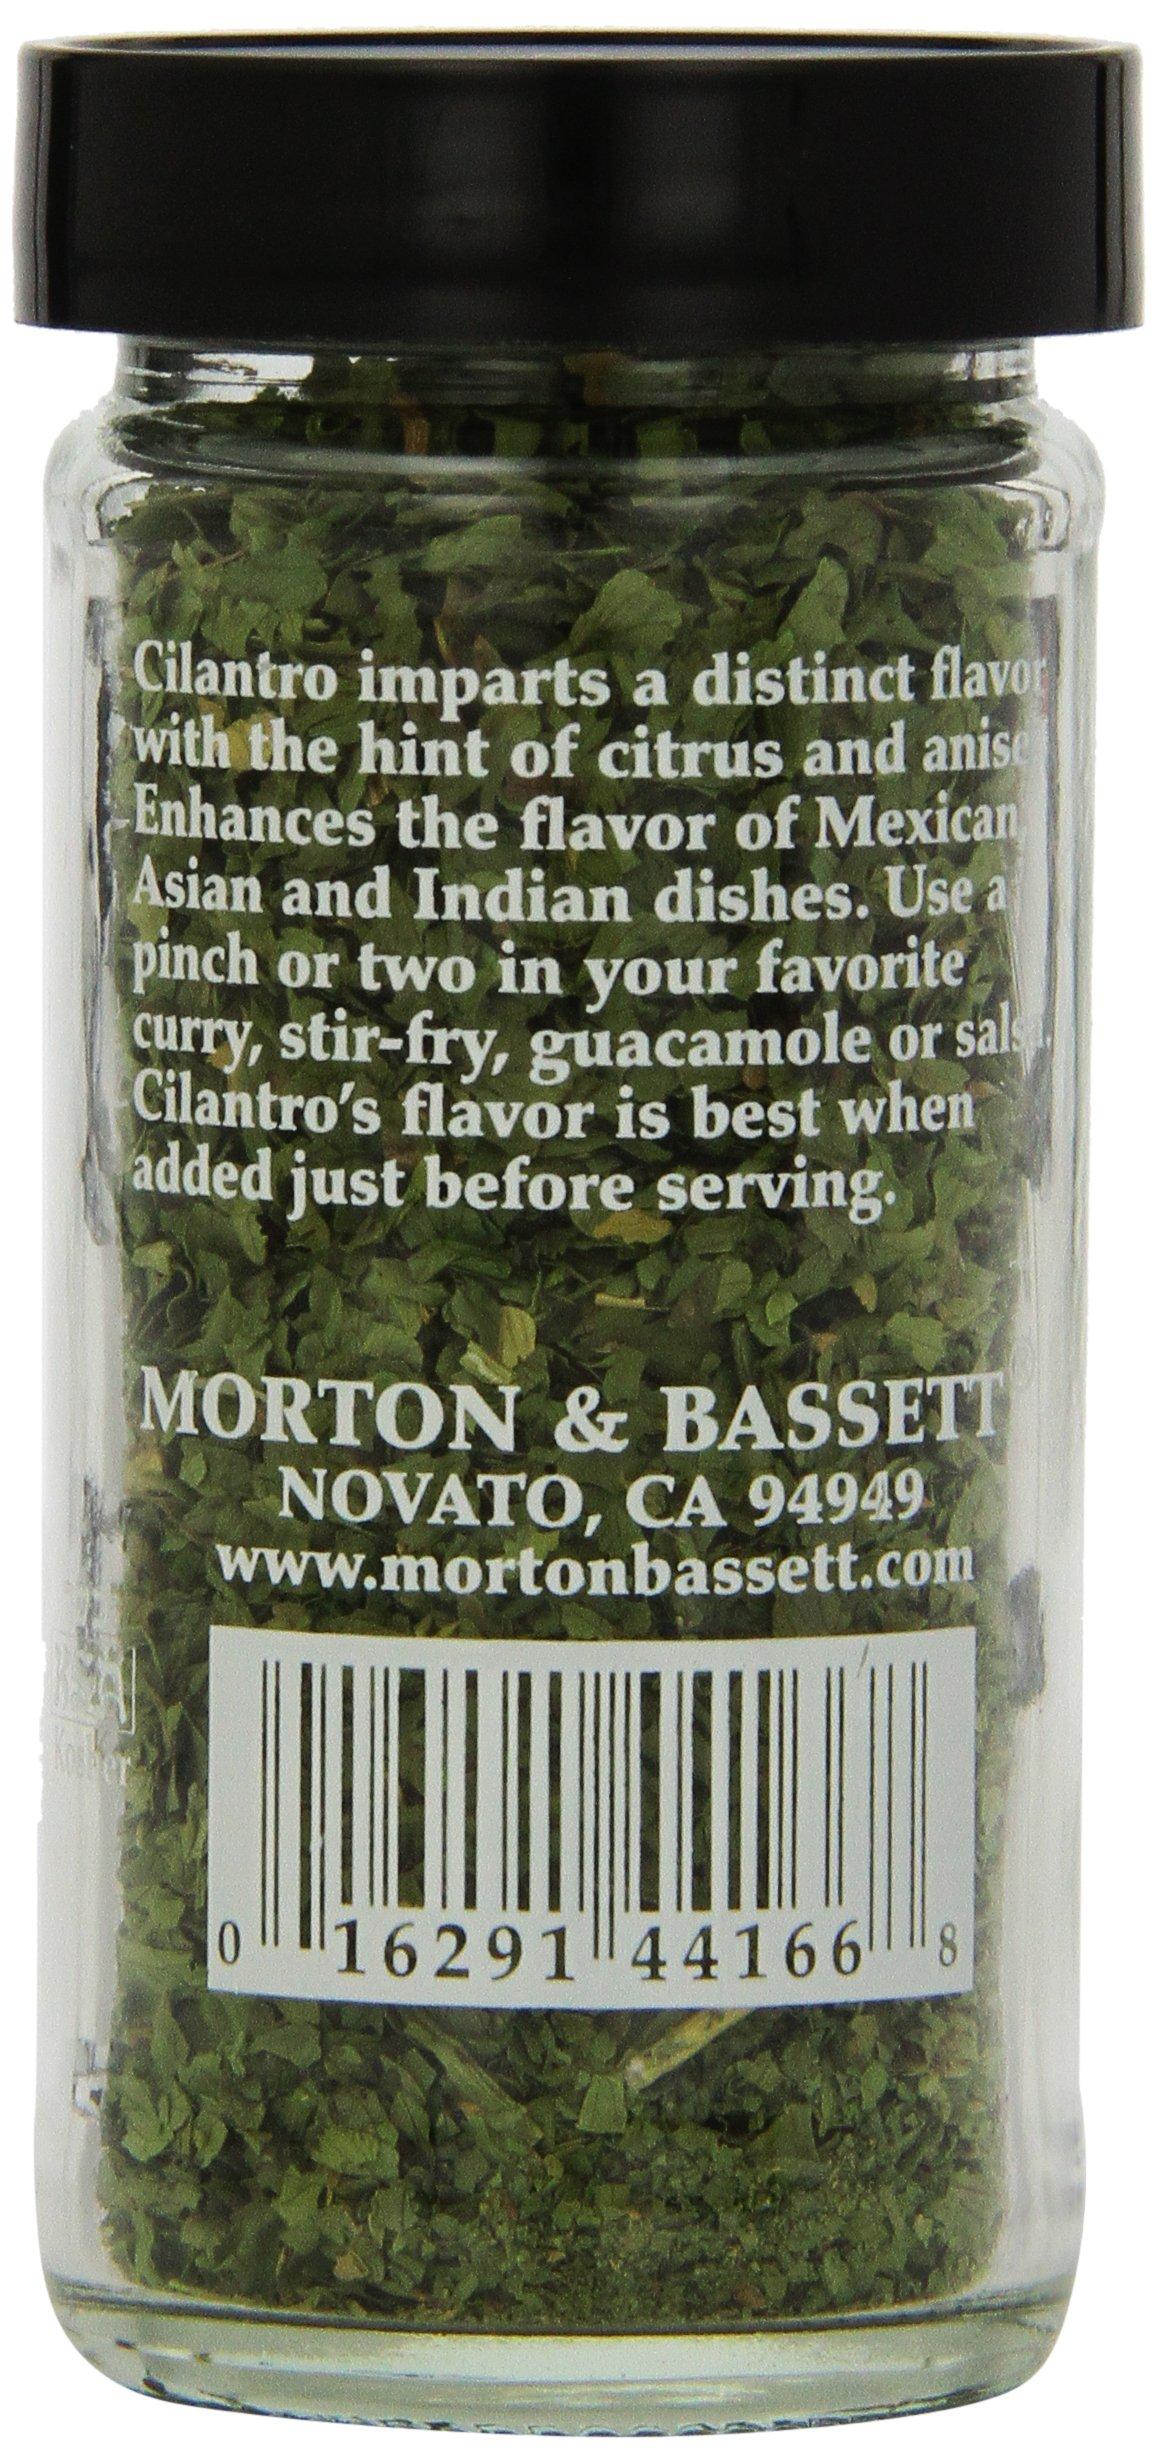 Morton & Bassett Cilantro, 0.3-Ounce Jars (Pack of 3) by Morton & Bassett (Image #2)